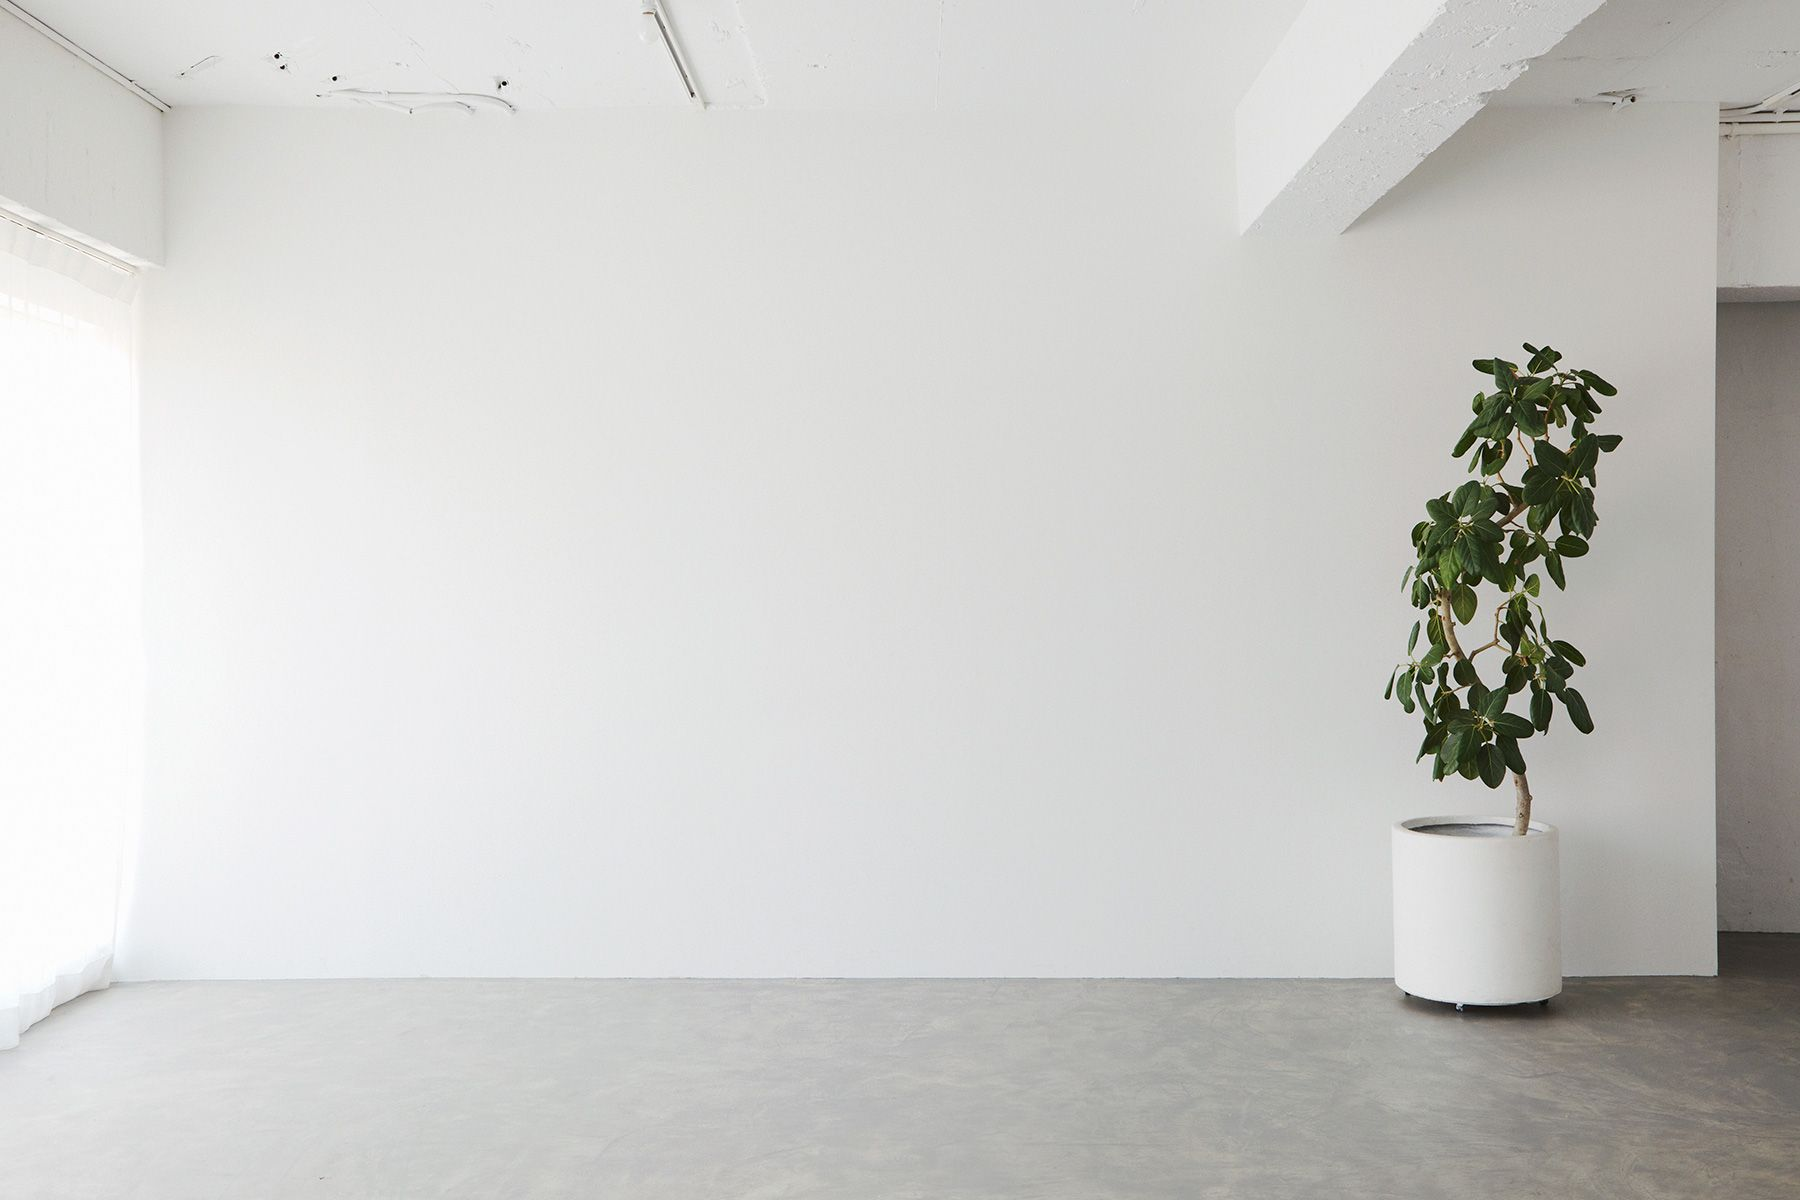 inTHE studio/nakameguro (インザスタジオ/ナカメグロ)MAIN ROOM